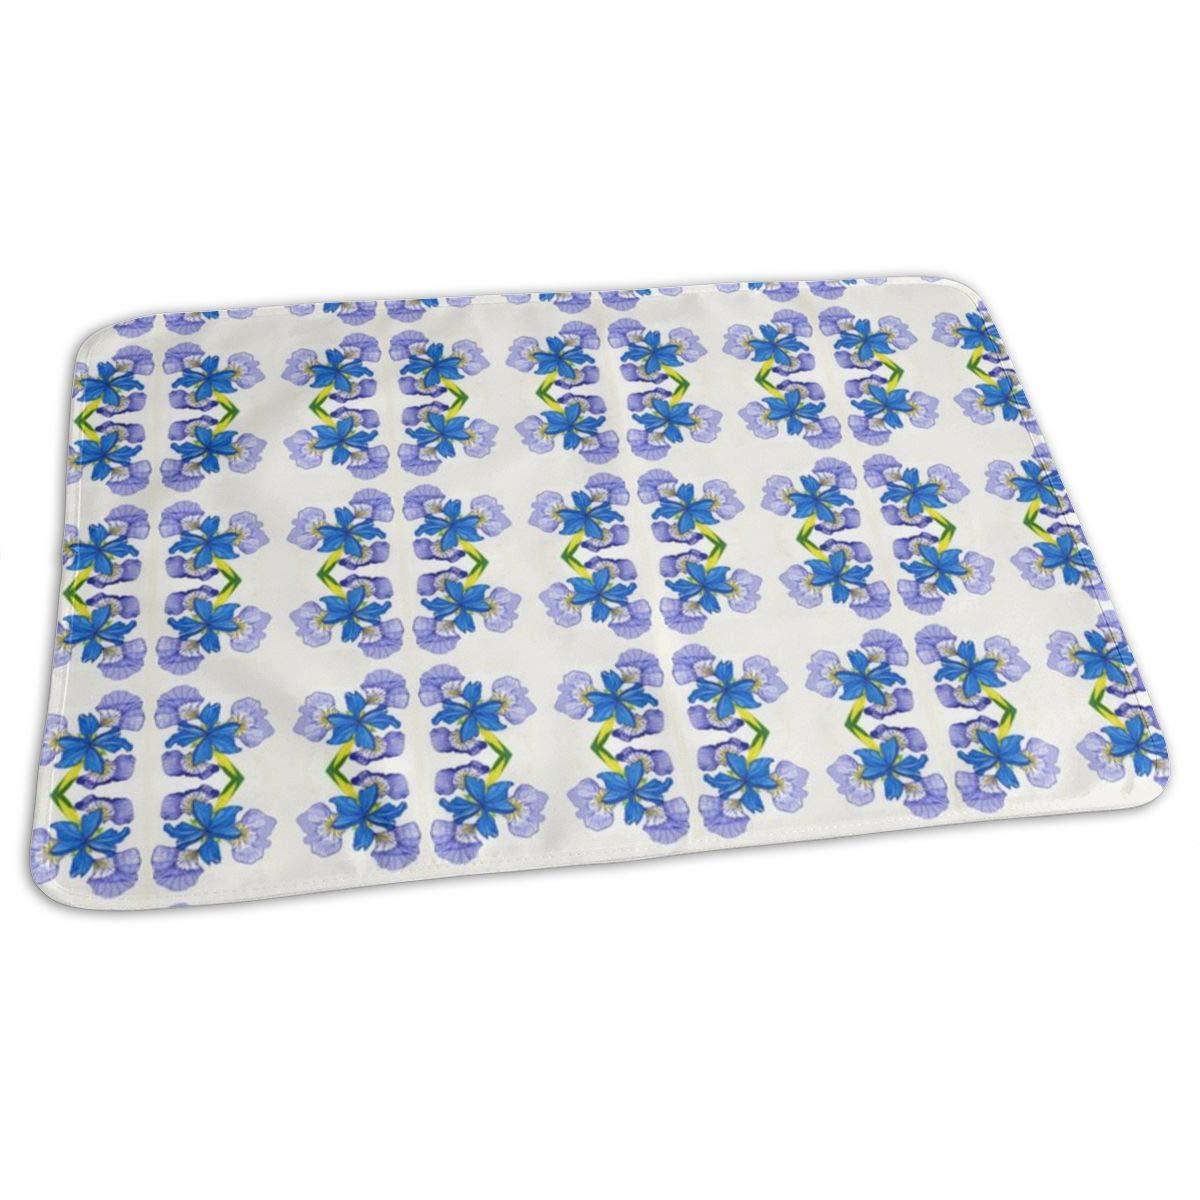 Blue Flag Iris Baby Portable Reusable Changing Pad Mat 19.7x27.5 inch